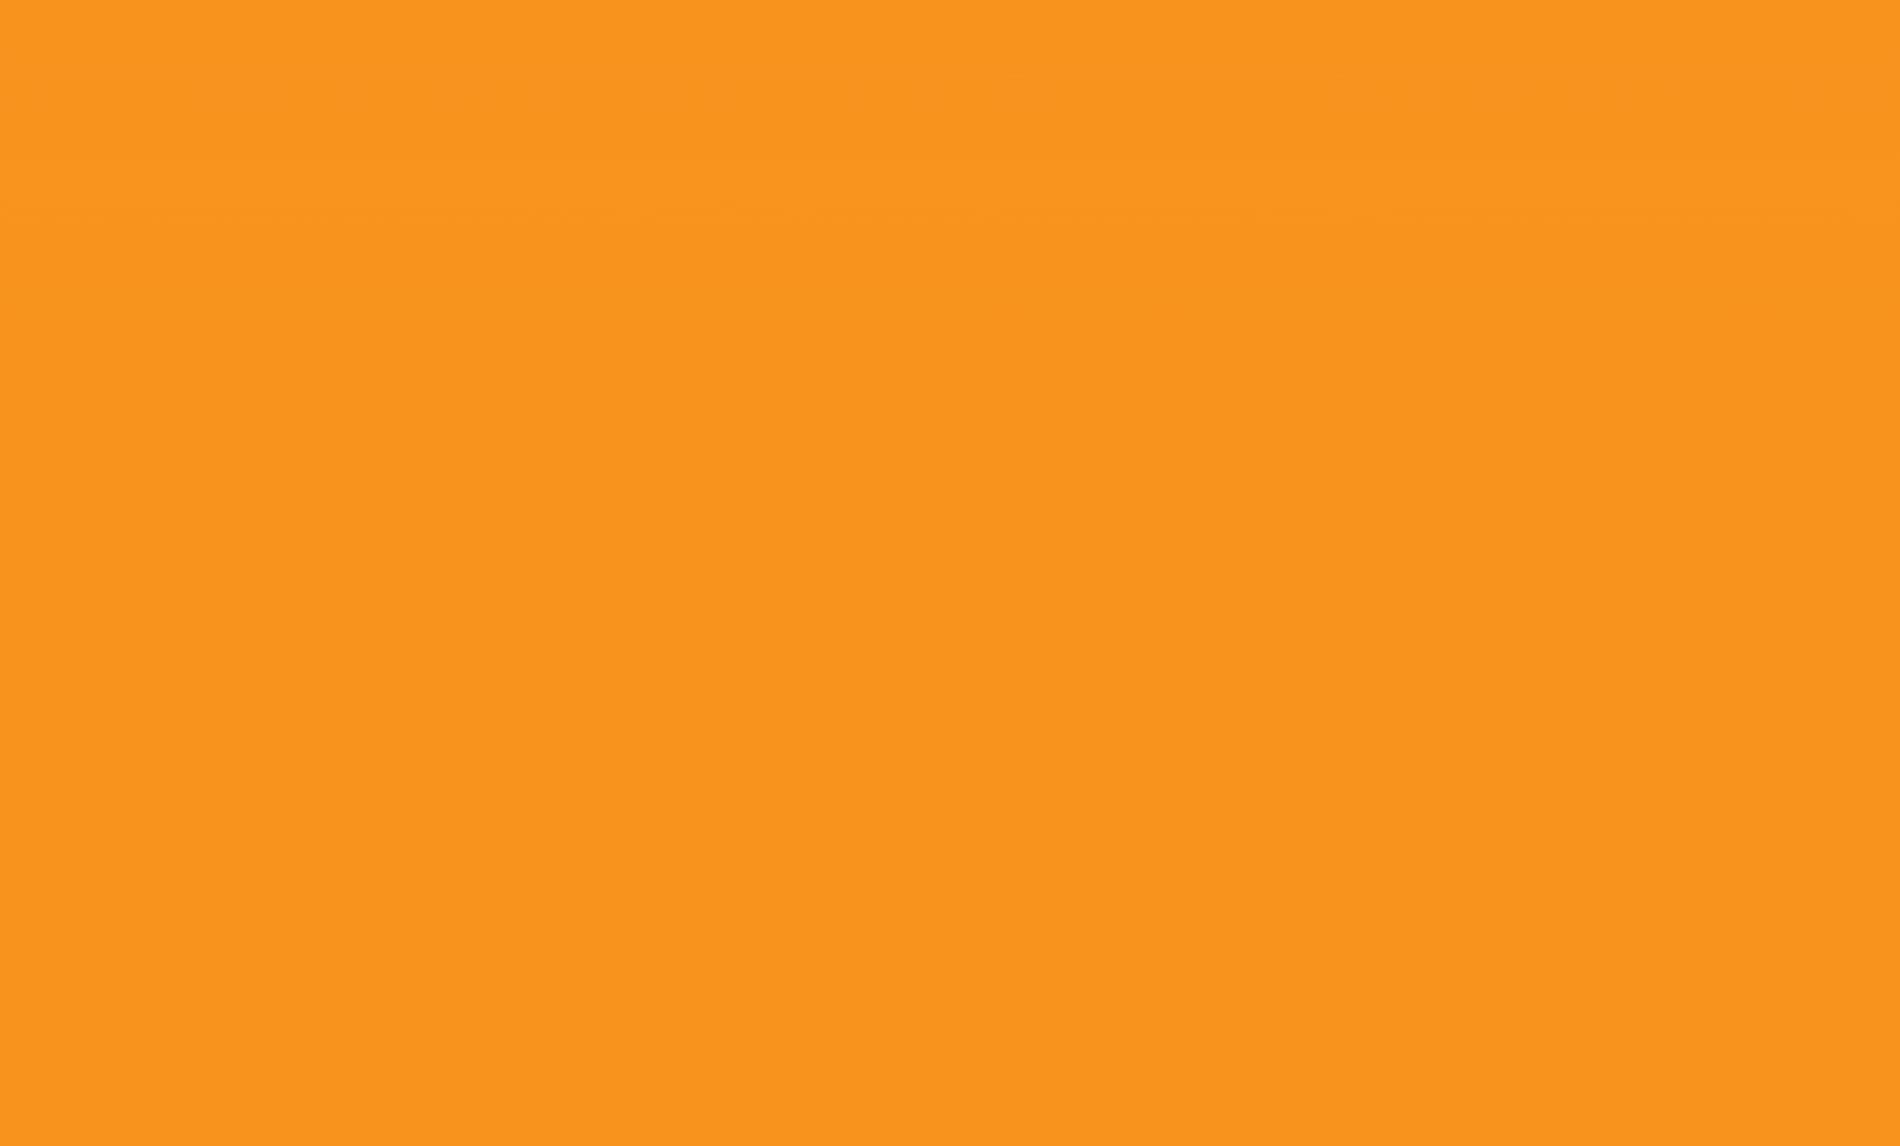 gradient-min.png